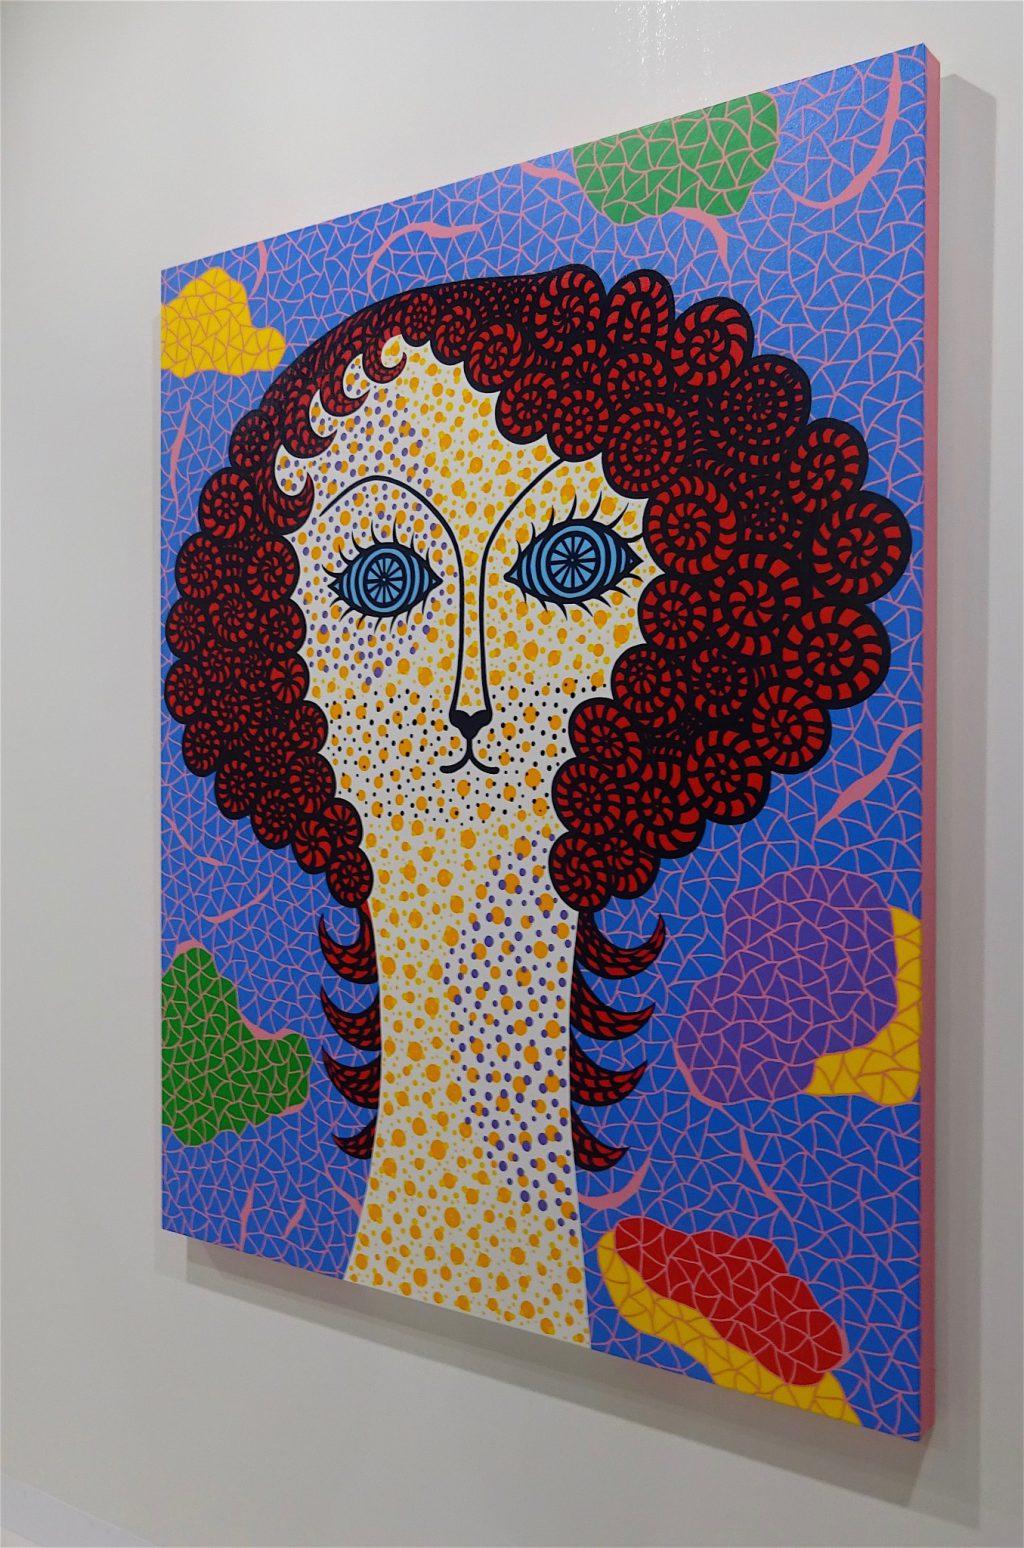 Yayoi Kusama, SELF-PORTRAIT BELROS, 2010, Acrylic on canvas, 162 x 130 cm